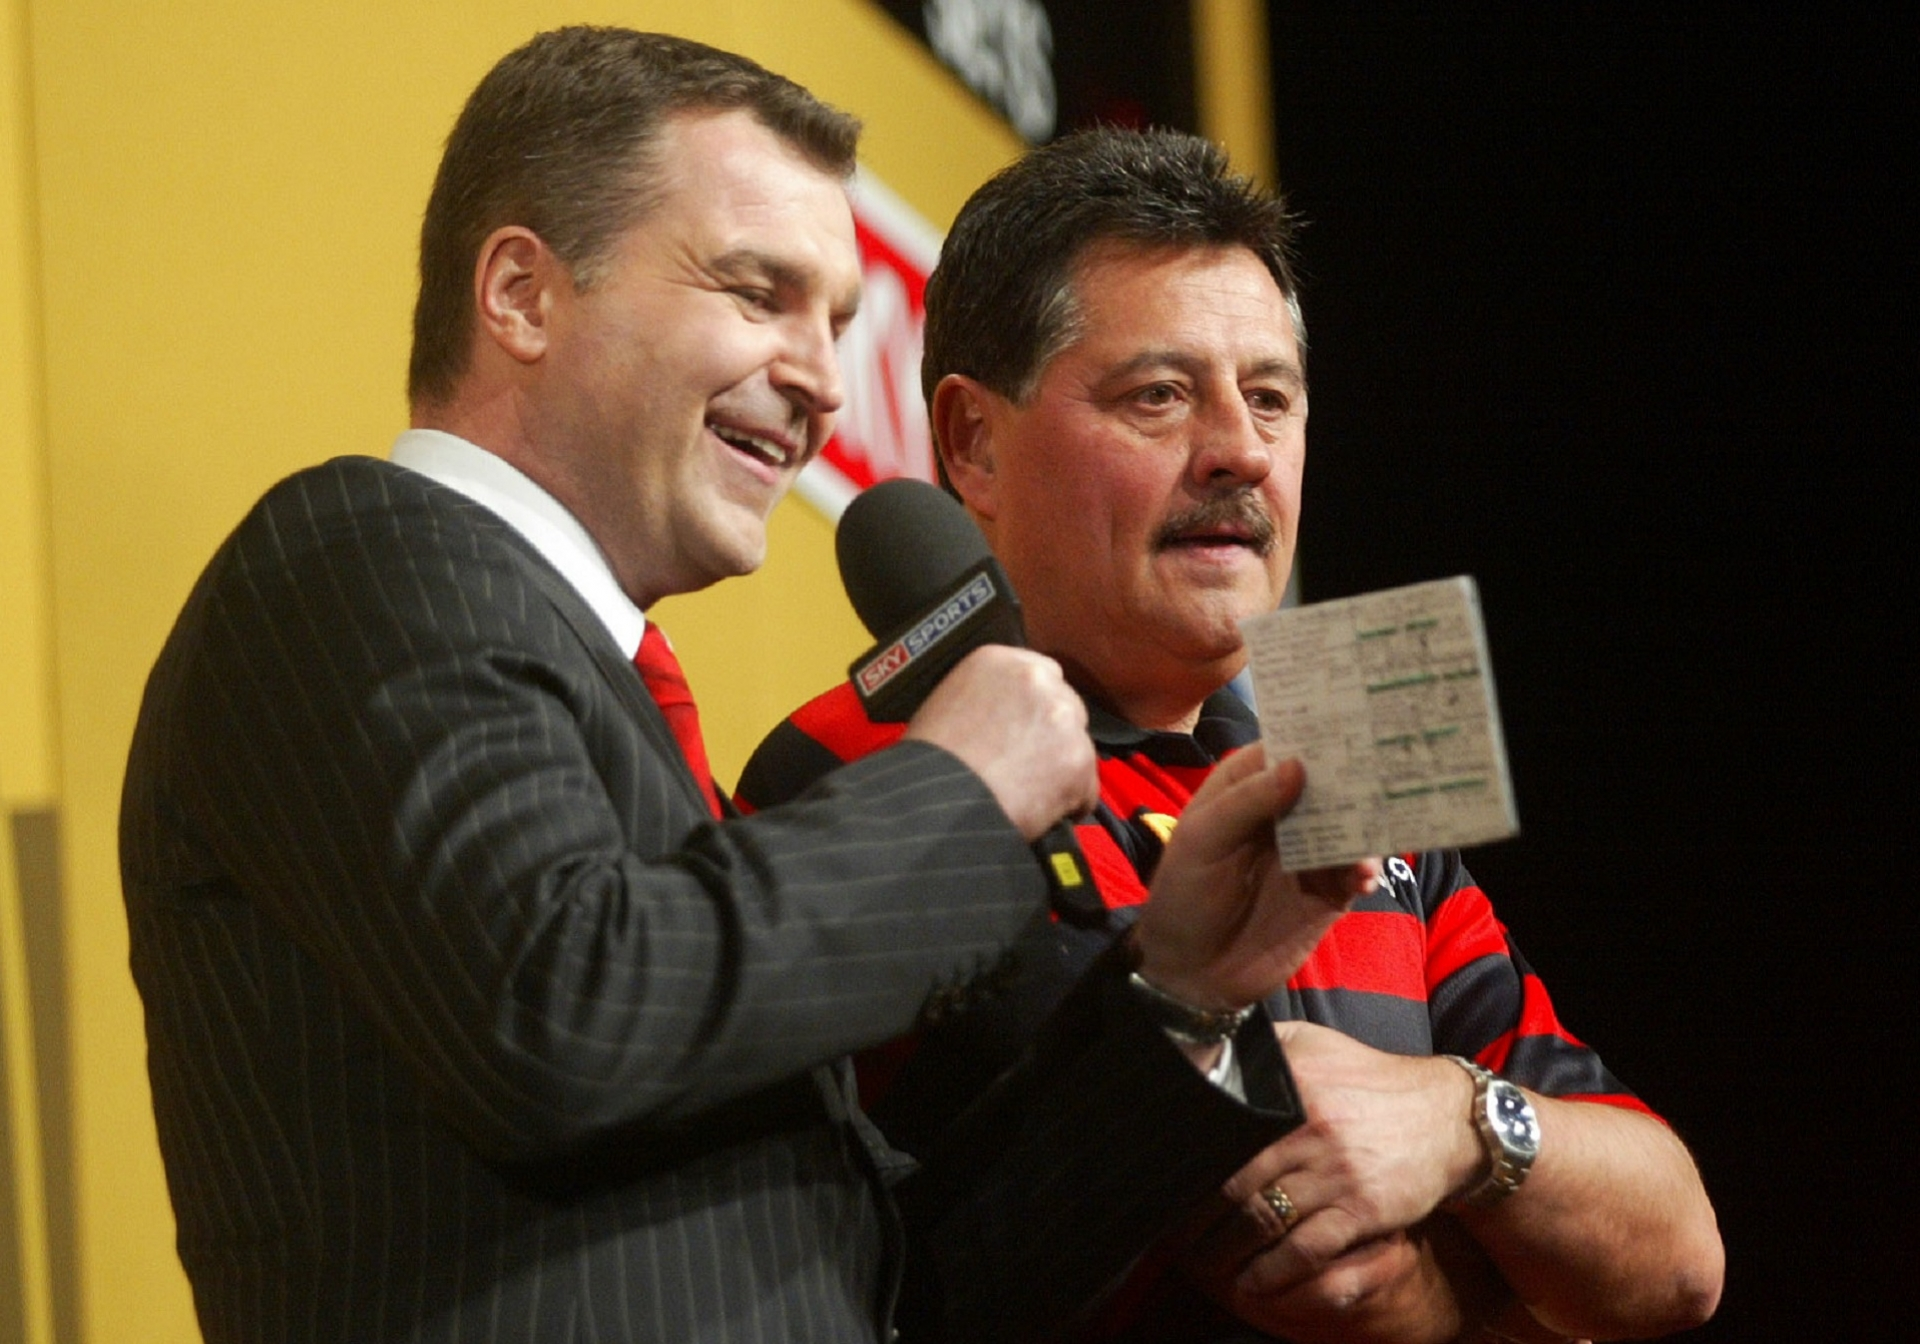 Dave Clark with Dennis Priestley